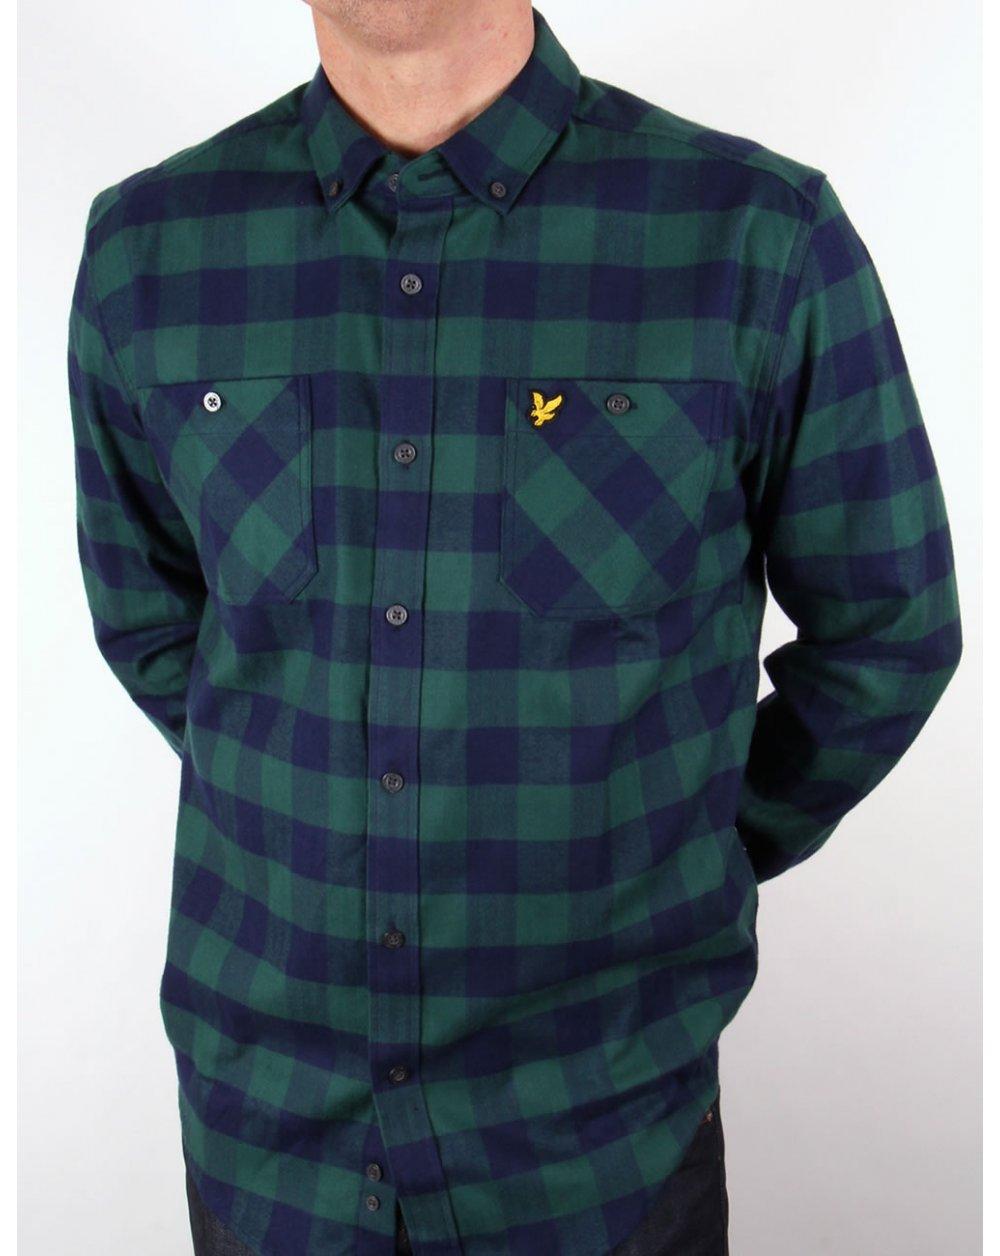 Lyle And Scott Herringbone Check Flannel Over Shirt Sea